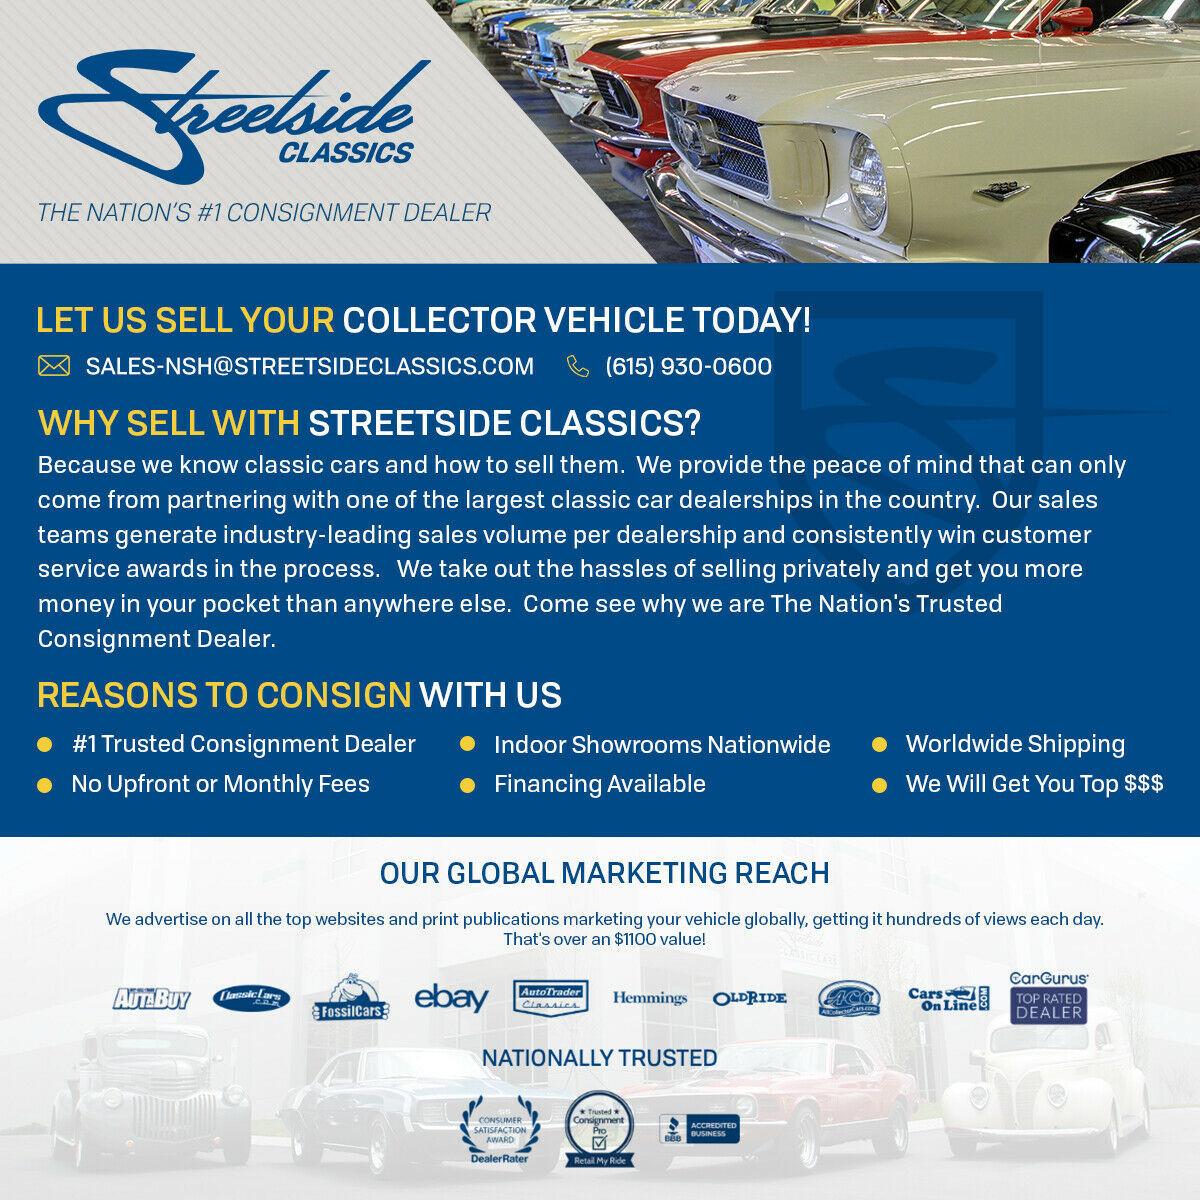 1973 Chevrolet Chevelle Laguna For Sale